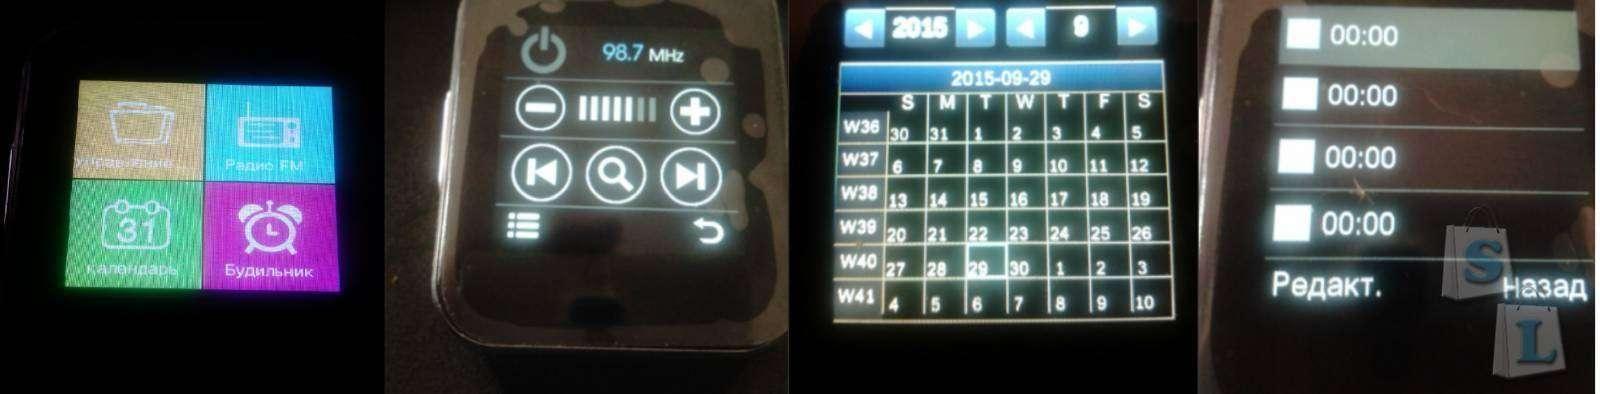 GearBest: Aiwatch GT08+ очередные неплохие смарт-часы